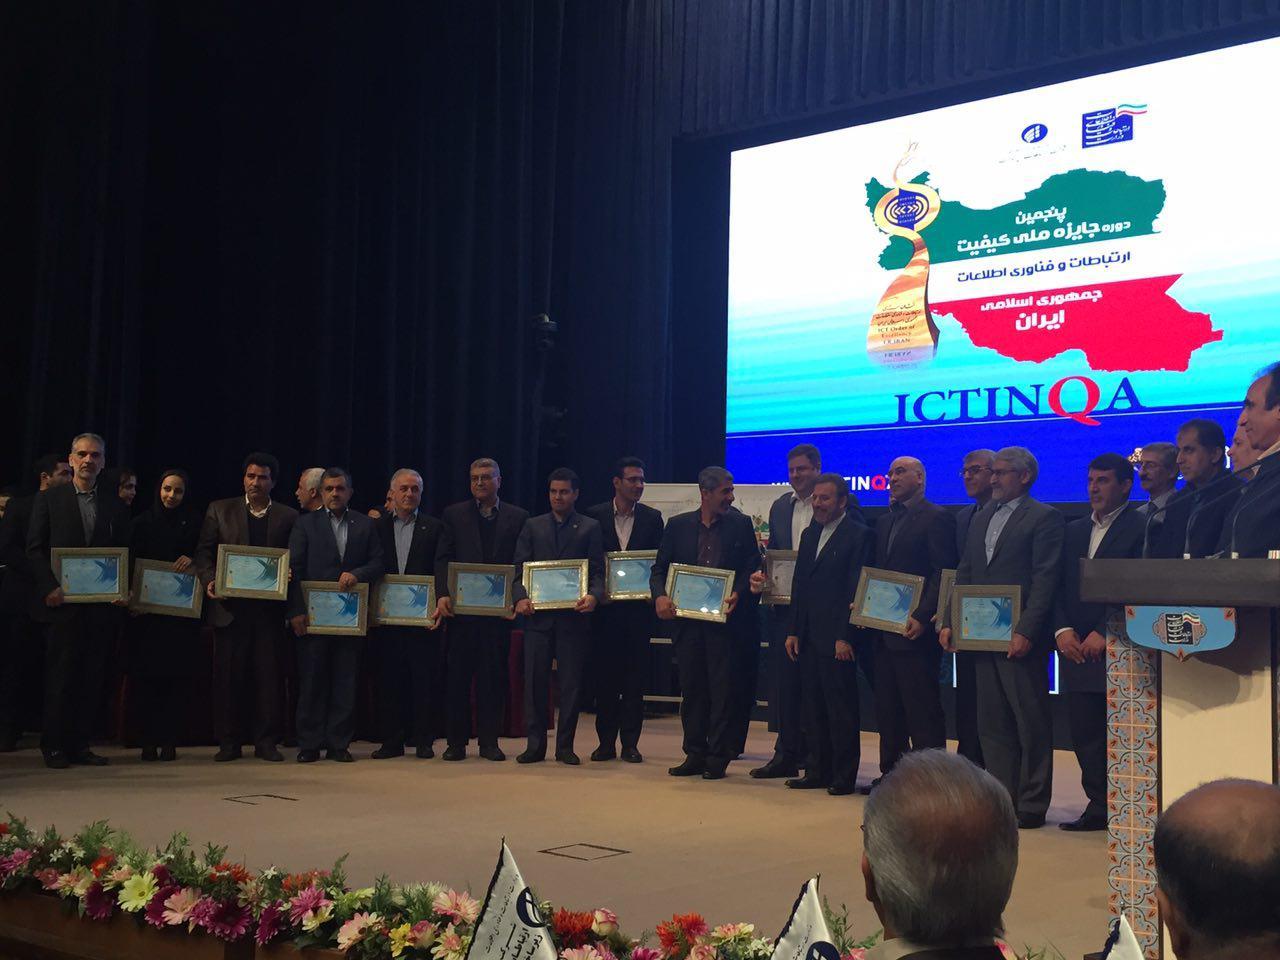 مراسم پنجمین دوره جایزه ict